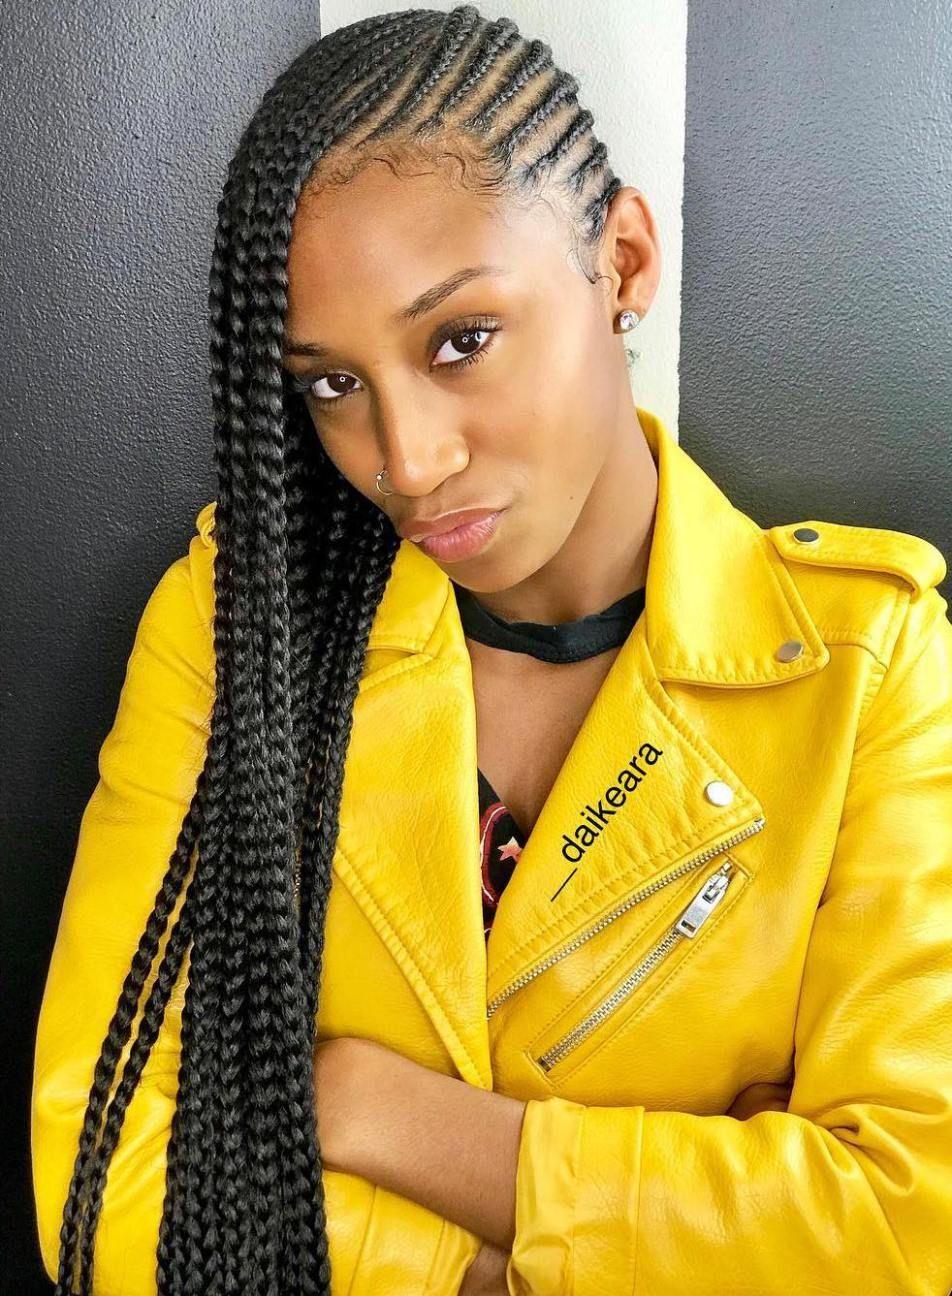 tall cool glass of lemonade braids